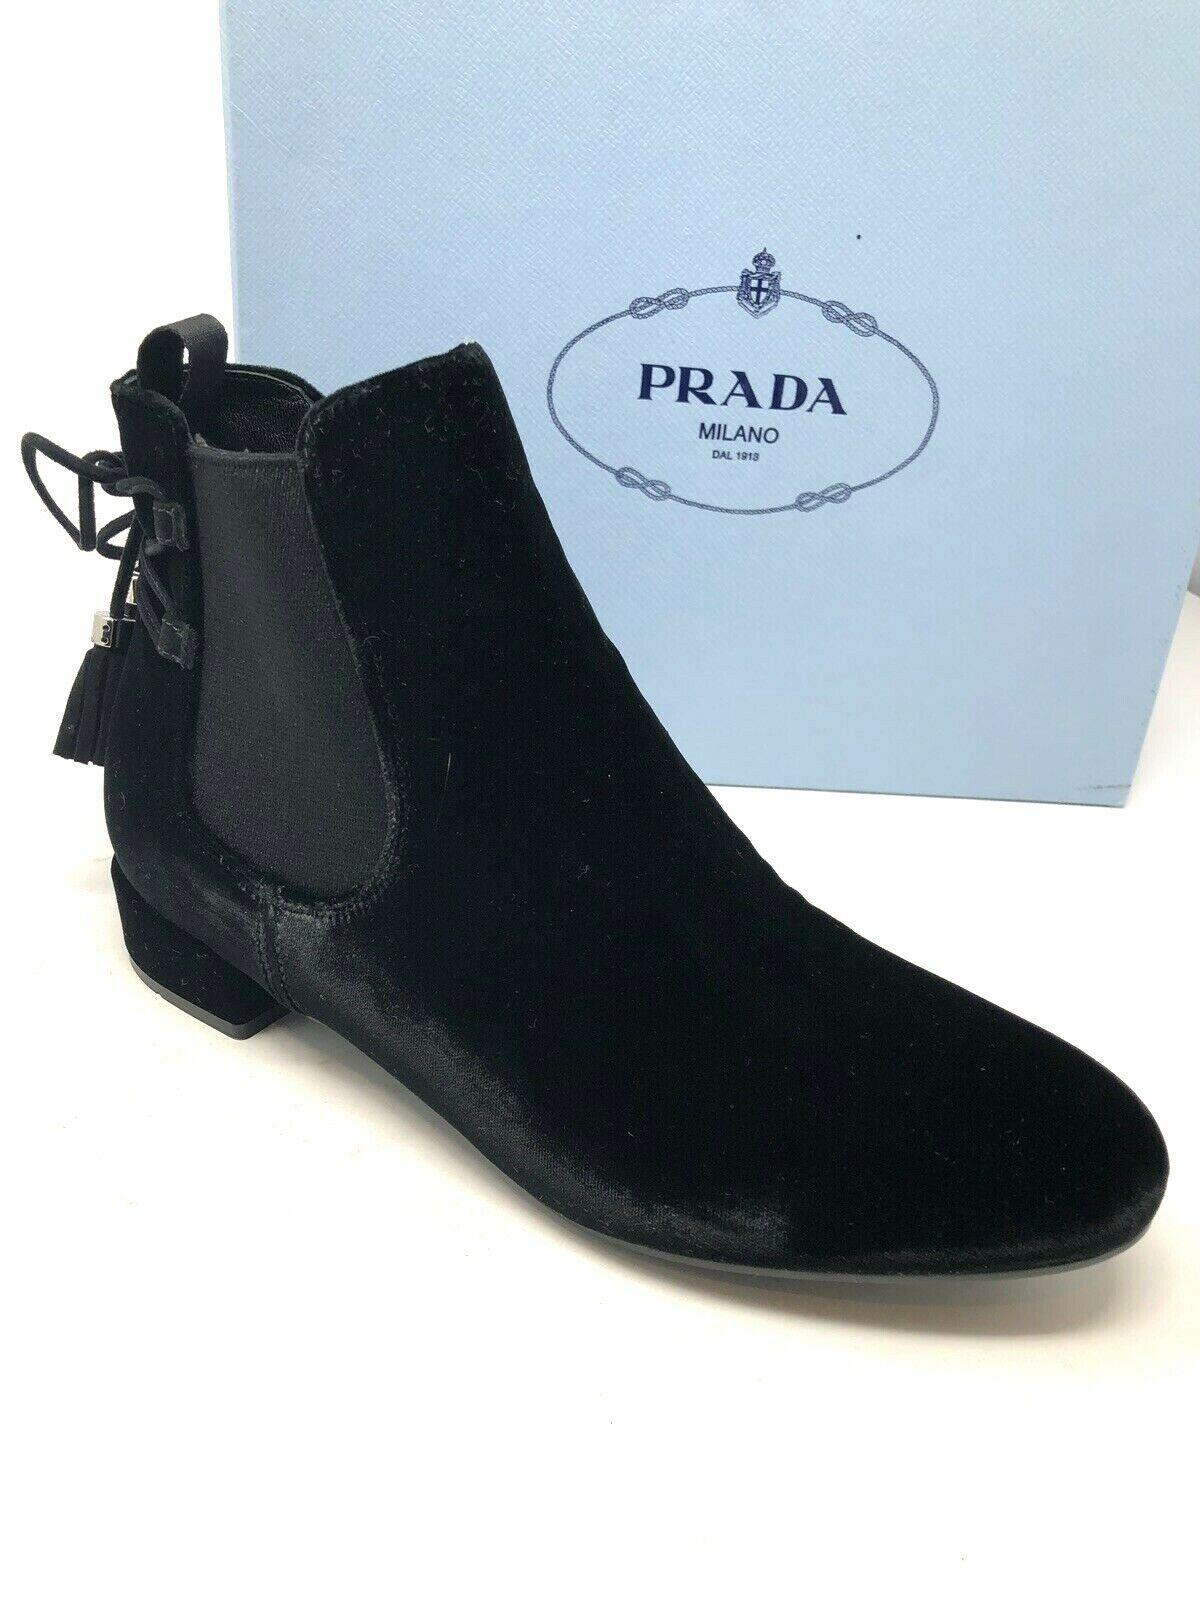 800 New PRADA Womens Black Boots Ladies shoes Size 6.5 US 36.5 EU